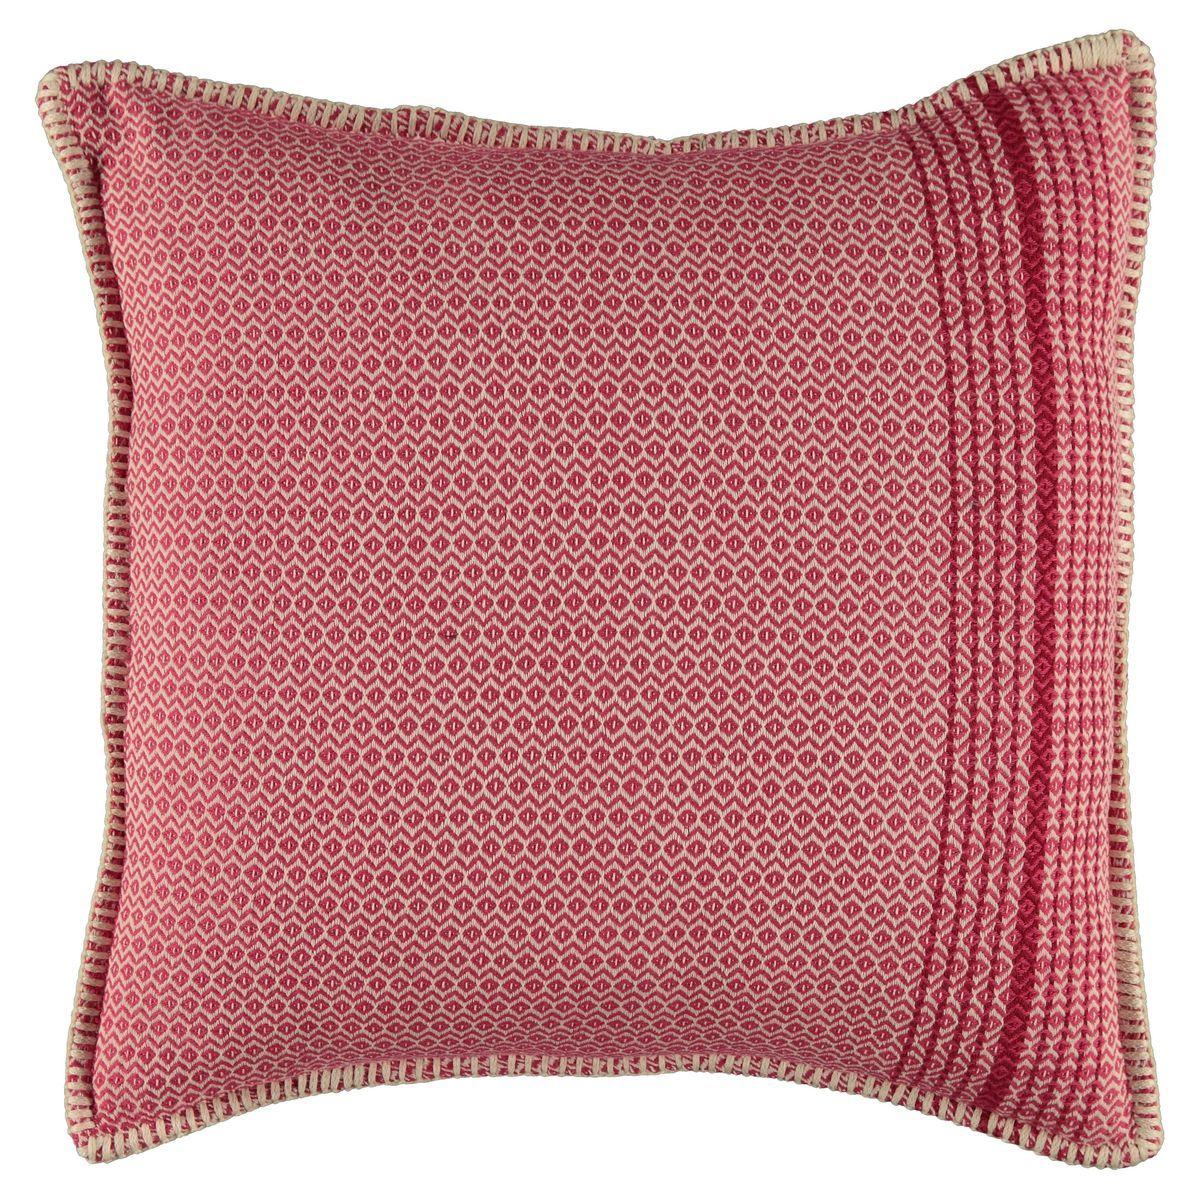 Cushion Cover / Gocek - Fucshia 40x40